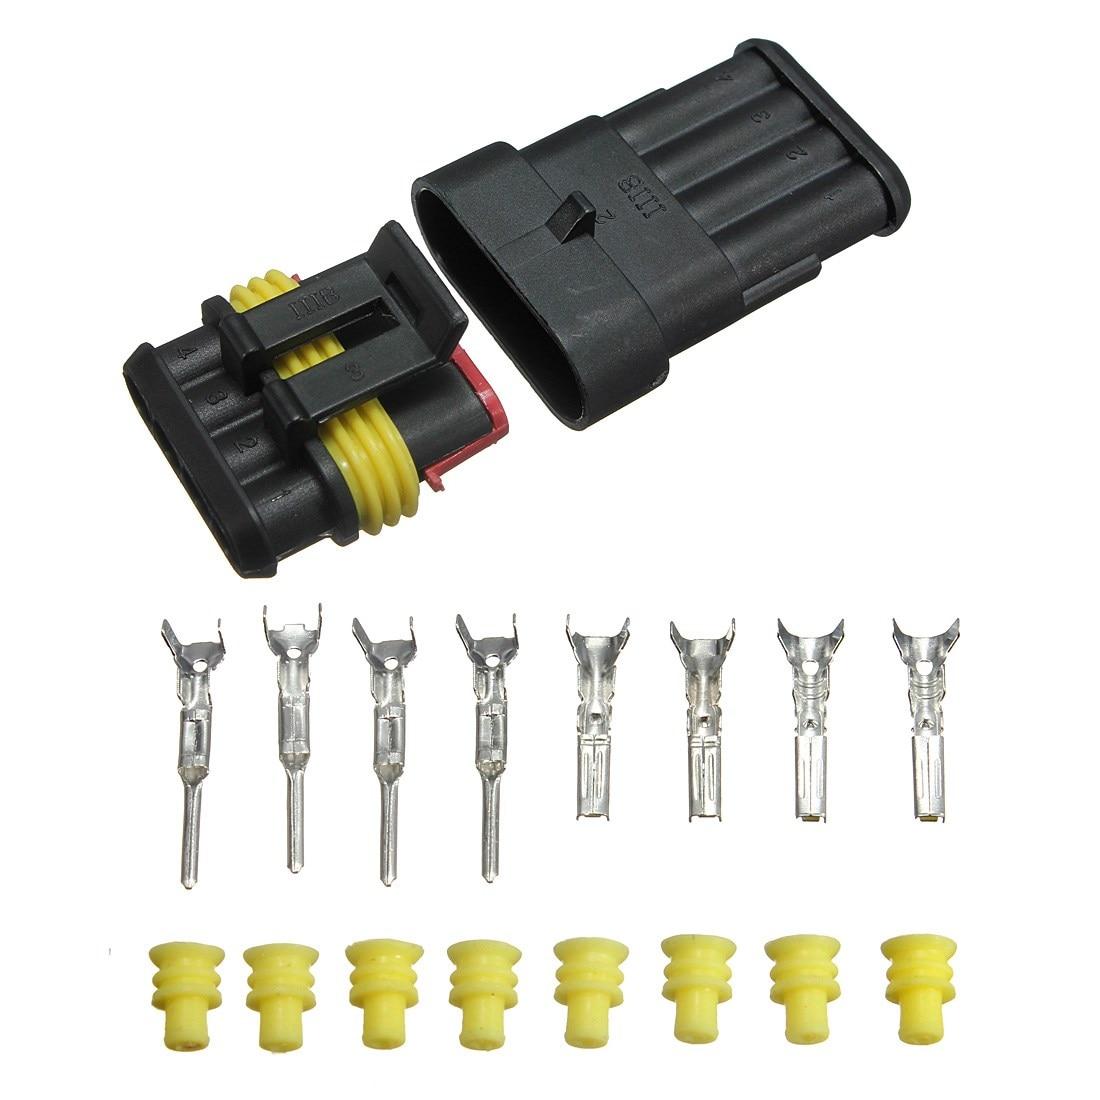 Brand New Car 4 Pin Way Sealed Waterproof Electrical Wire Connector Plug Set Truck Caravan